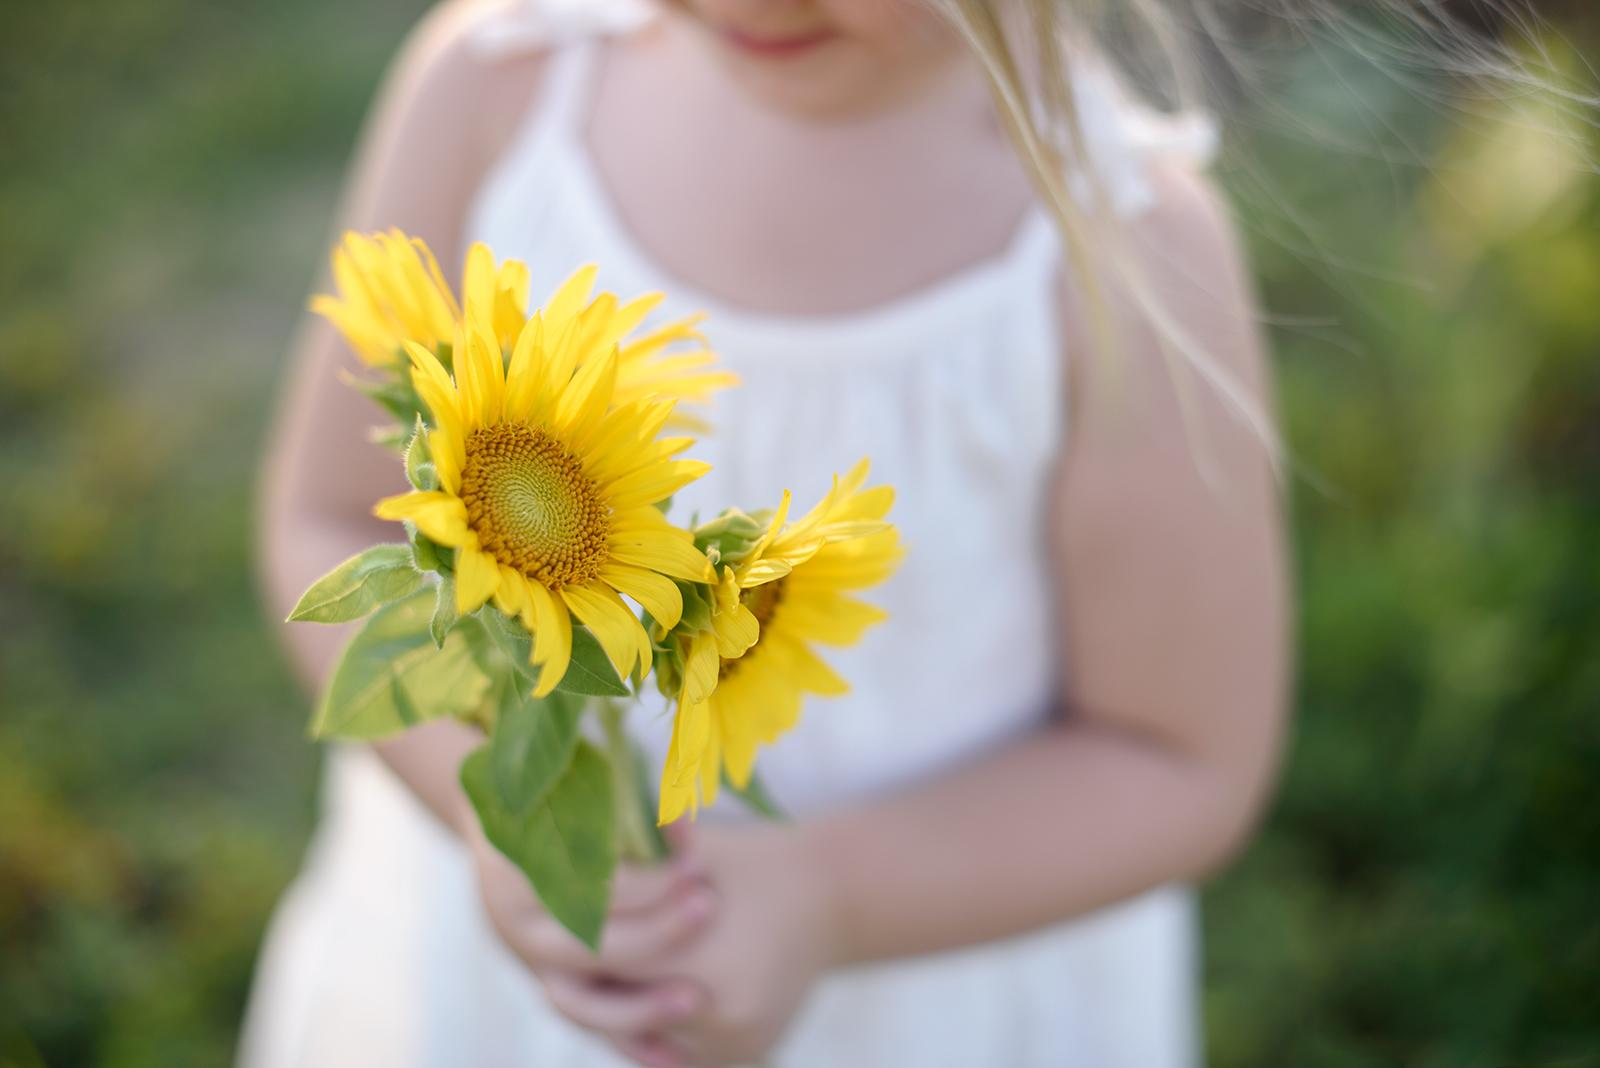 sunflowers girl toddler family photography summer